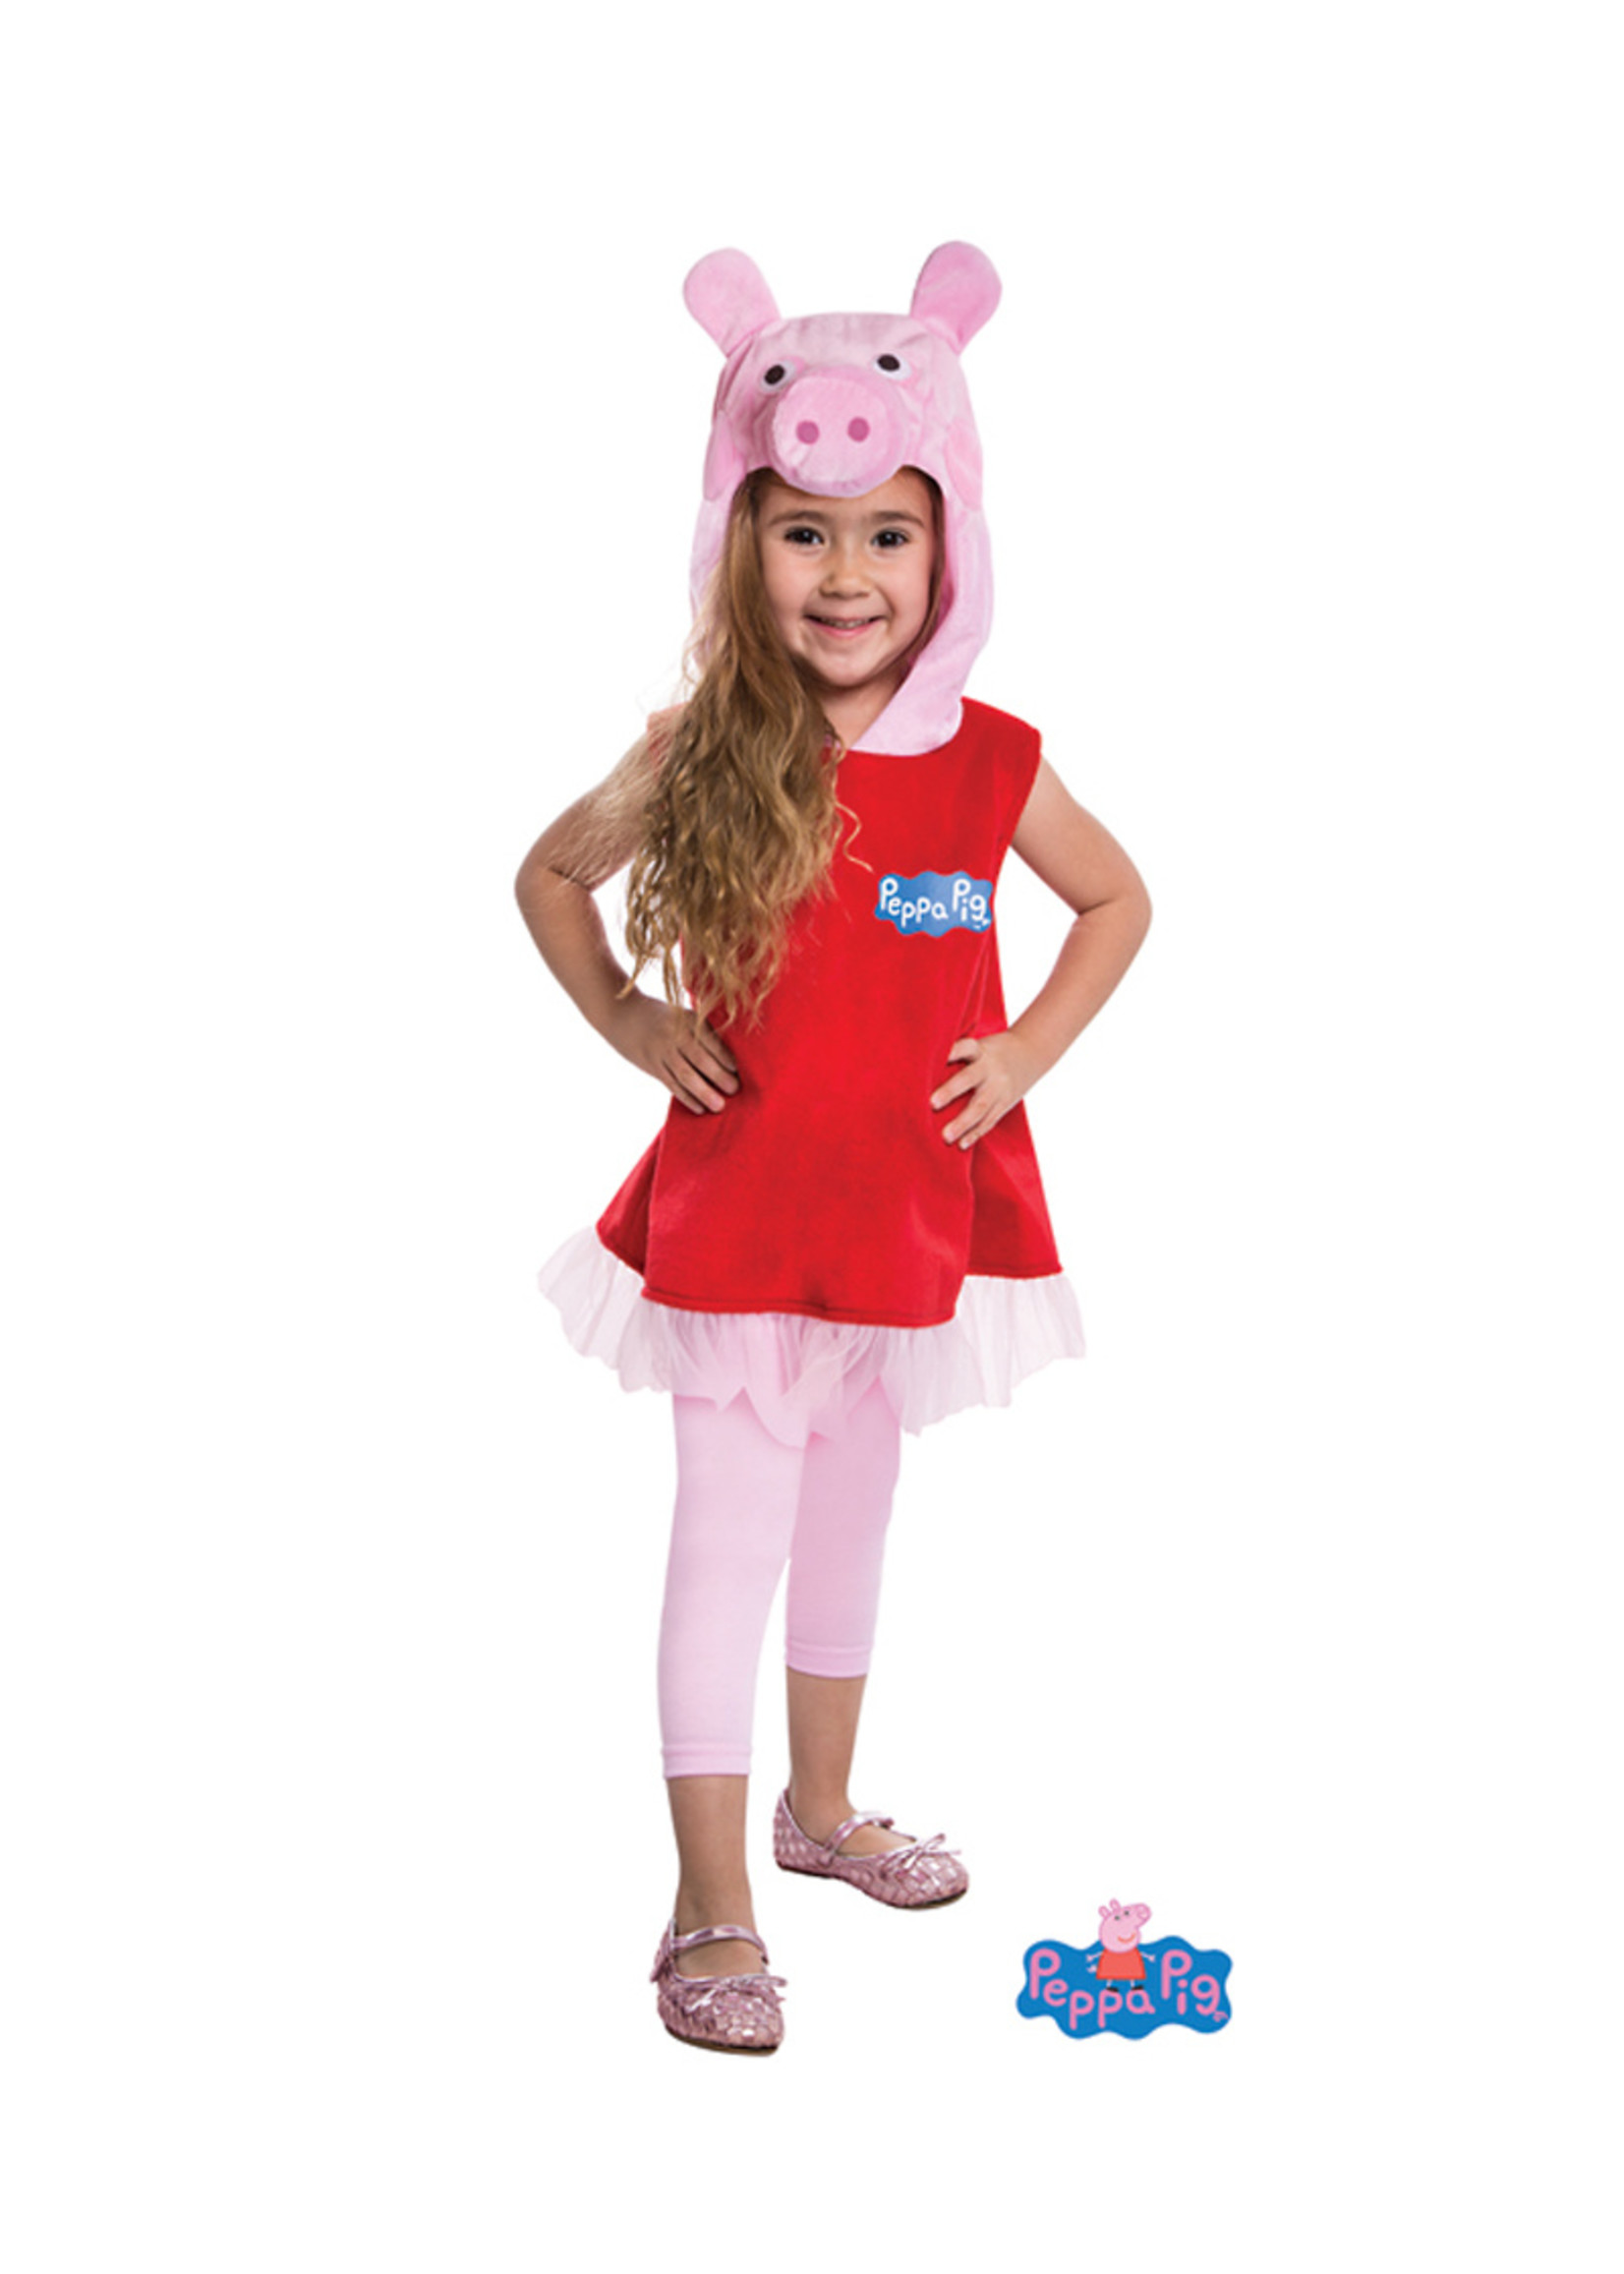 PALAMON Peppa Pig Delux Costume - Toddler